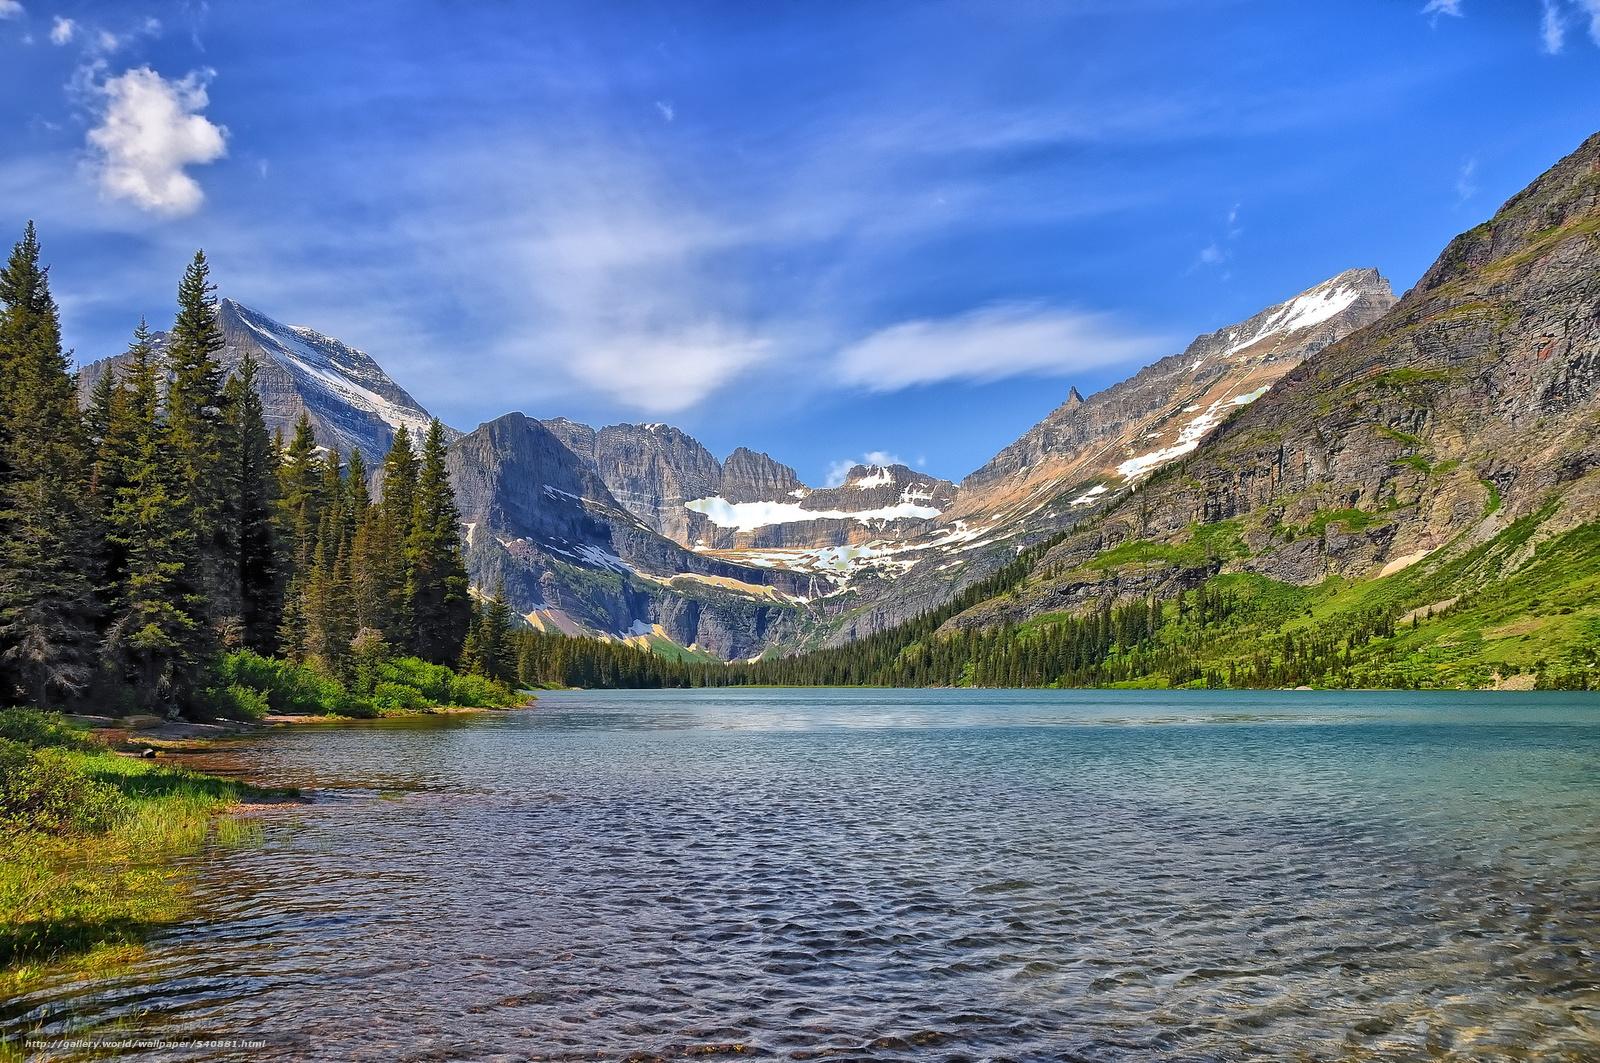 Download wallpaper Lake Josephine Glacier National Park Montana 1600x1063